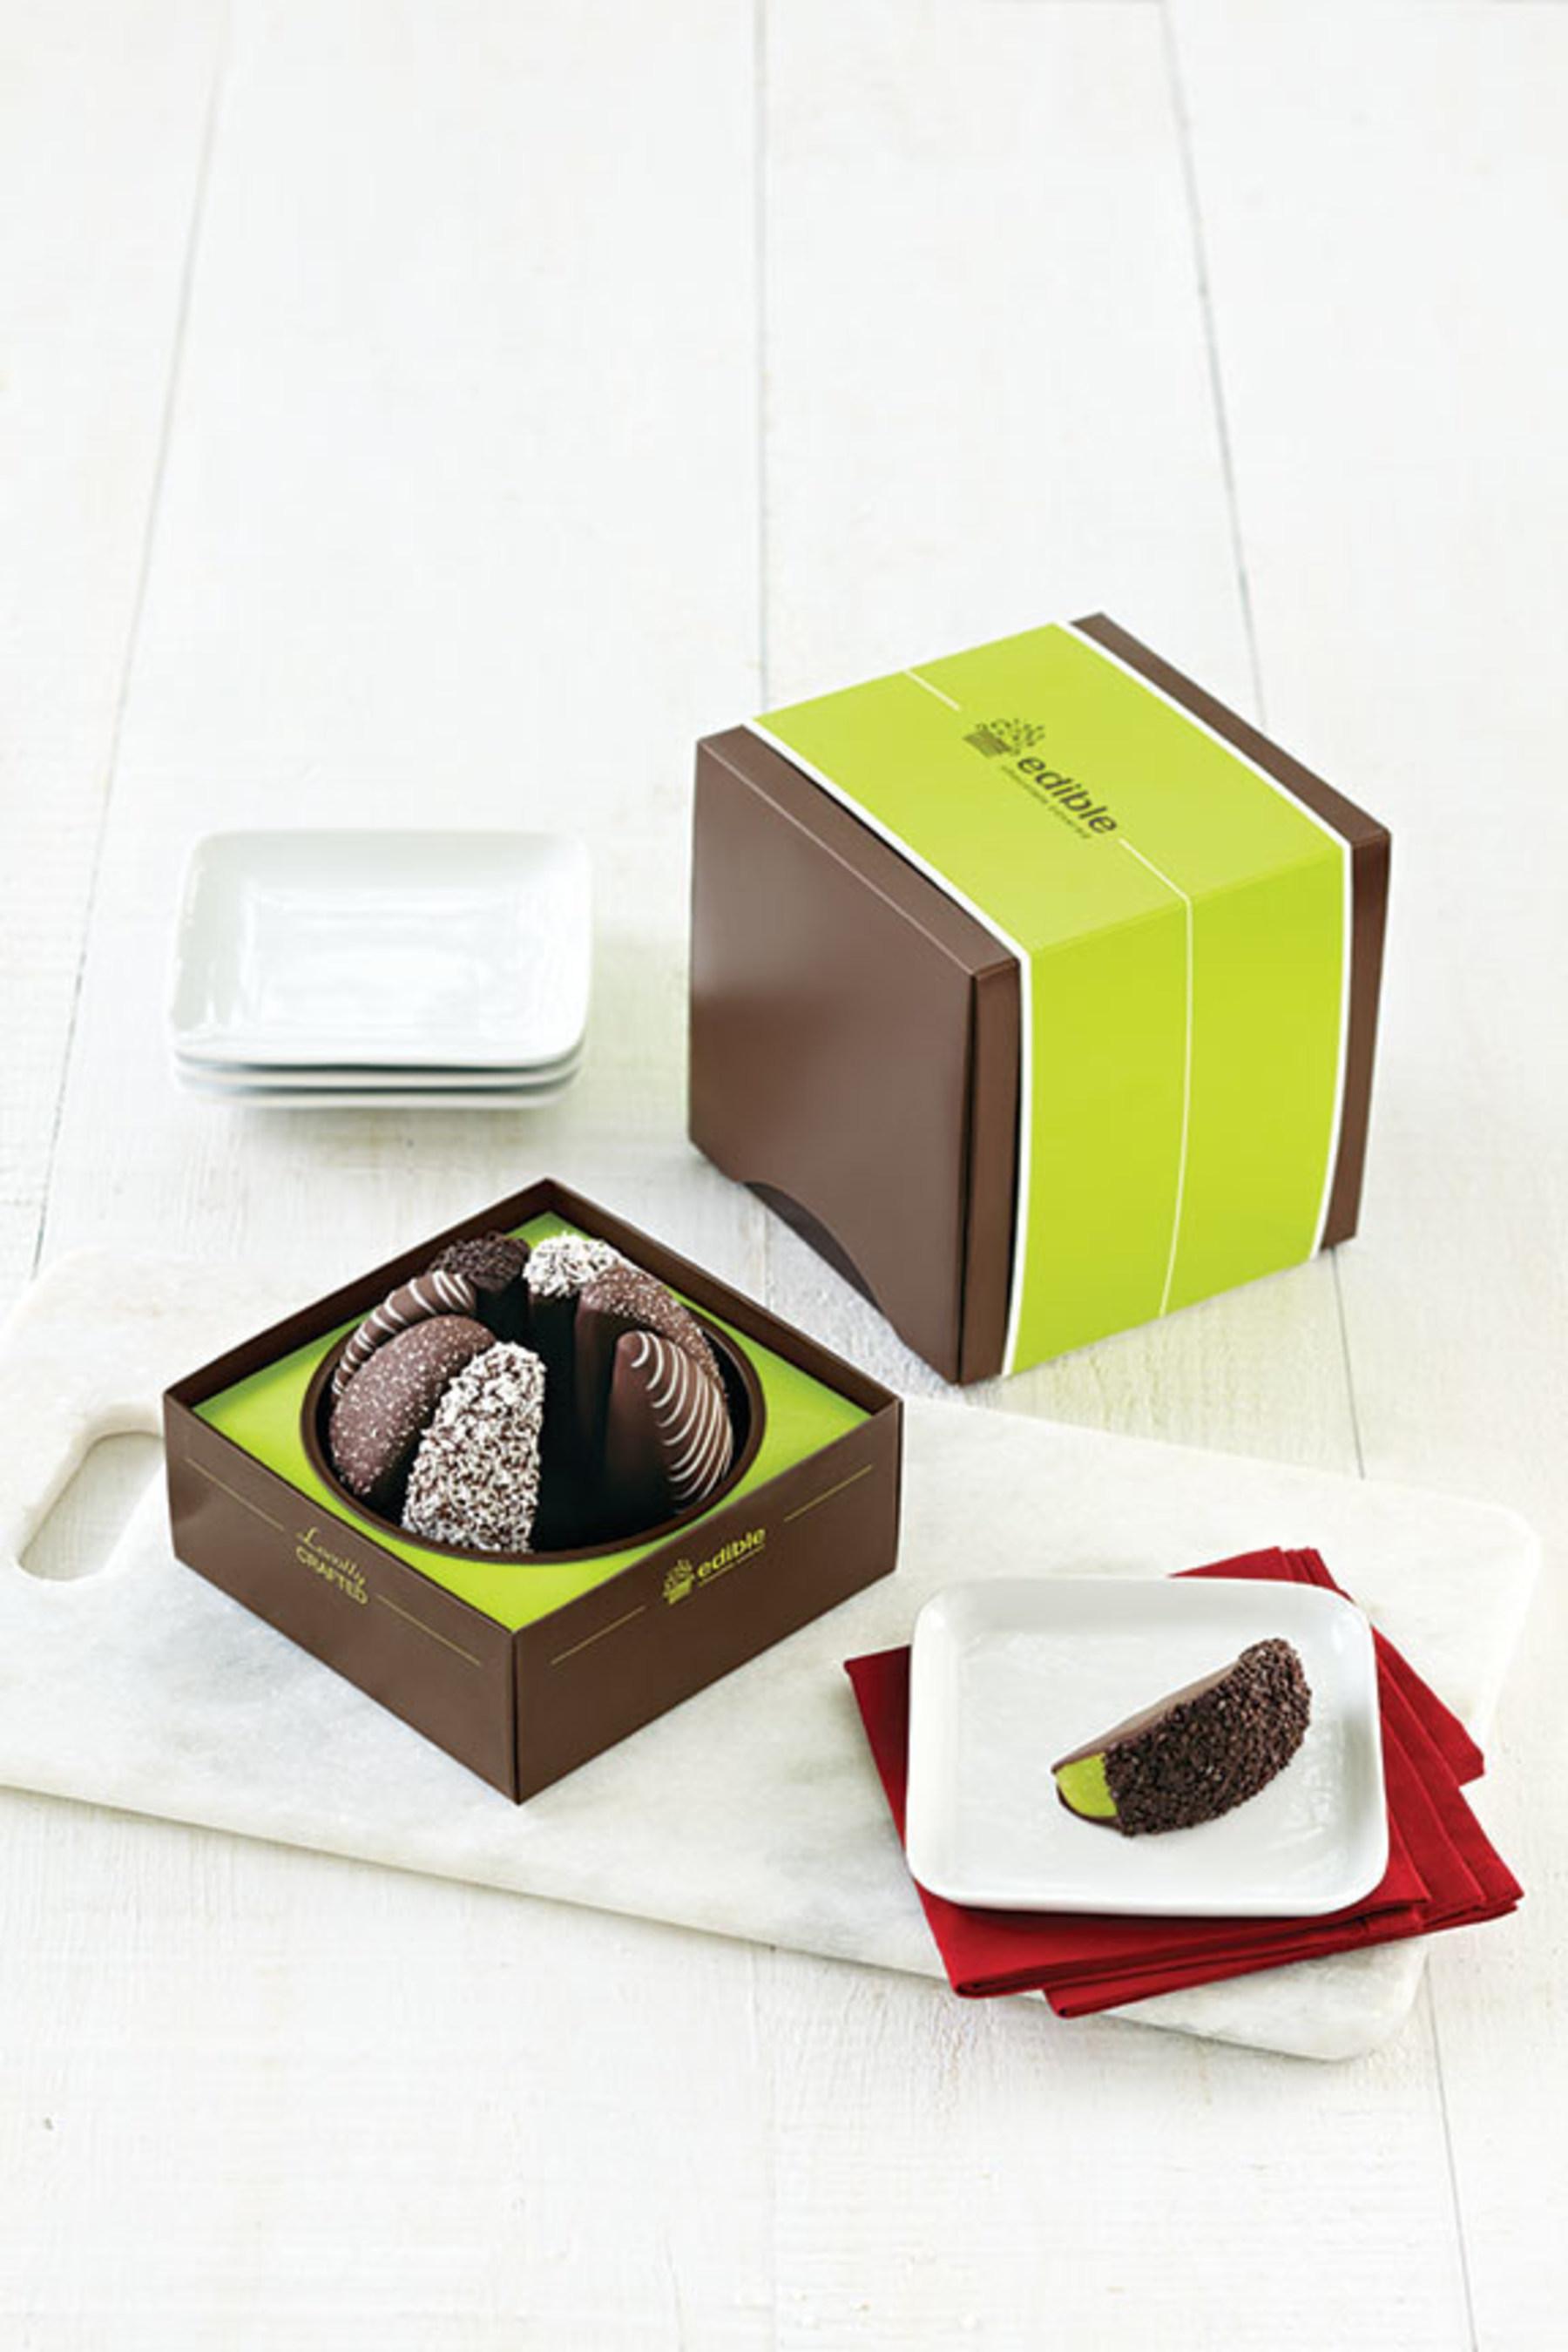 Edible Arrangements Gourmet Shareable(TM) Caramel Apple - Black & White